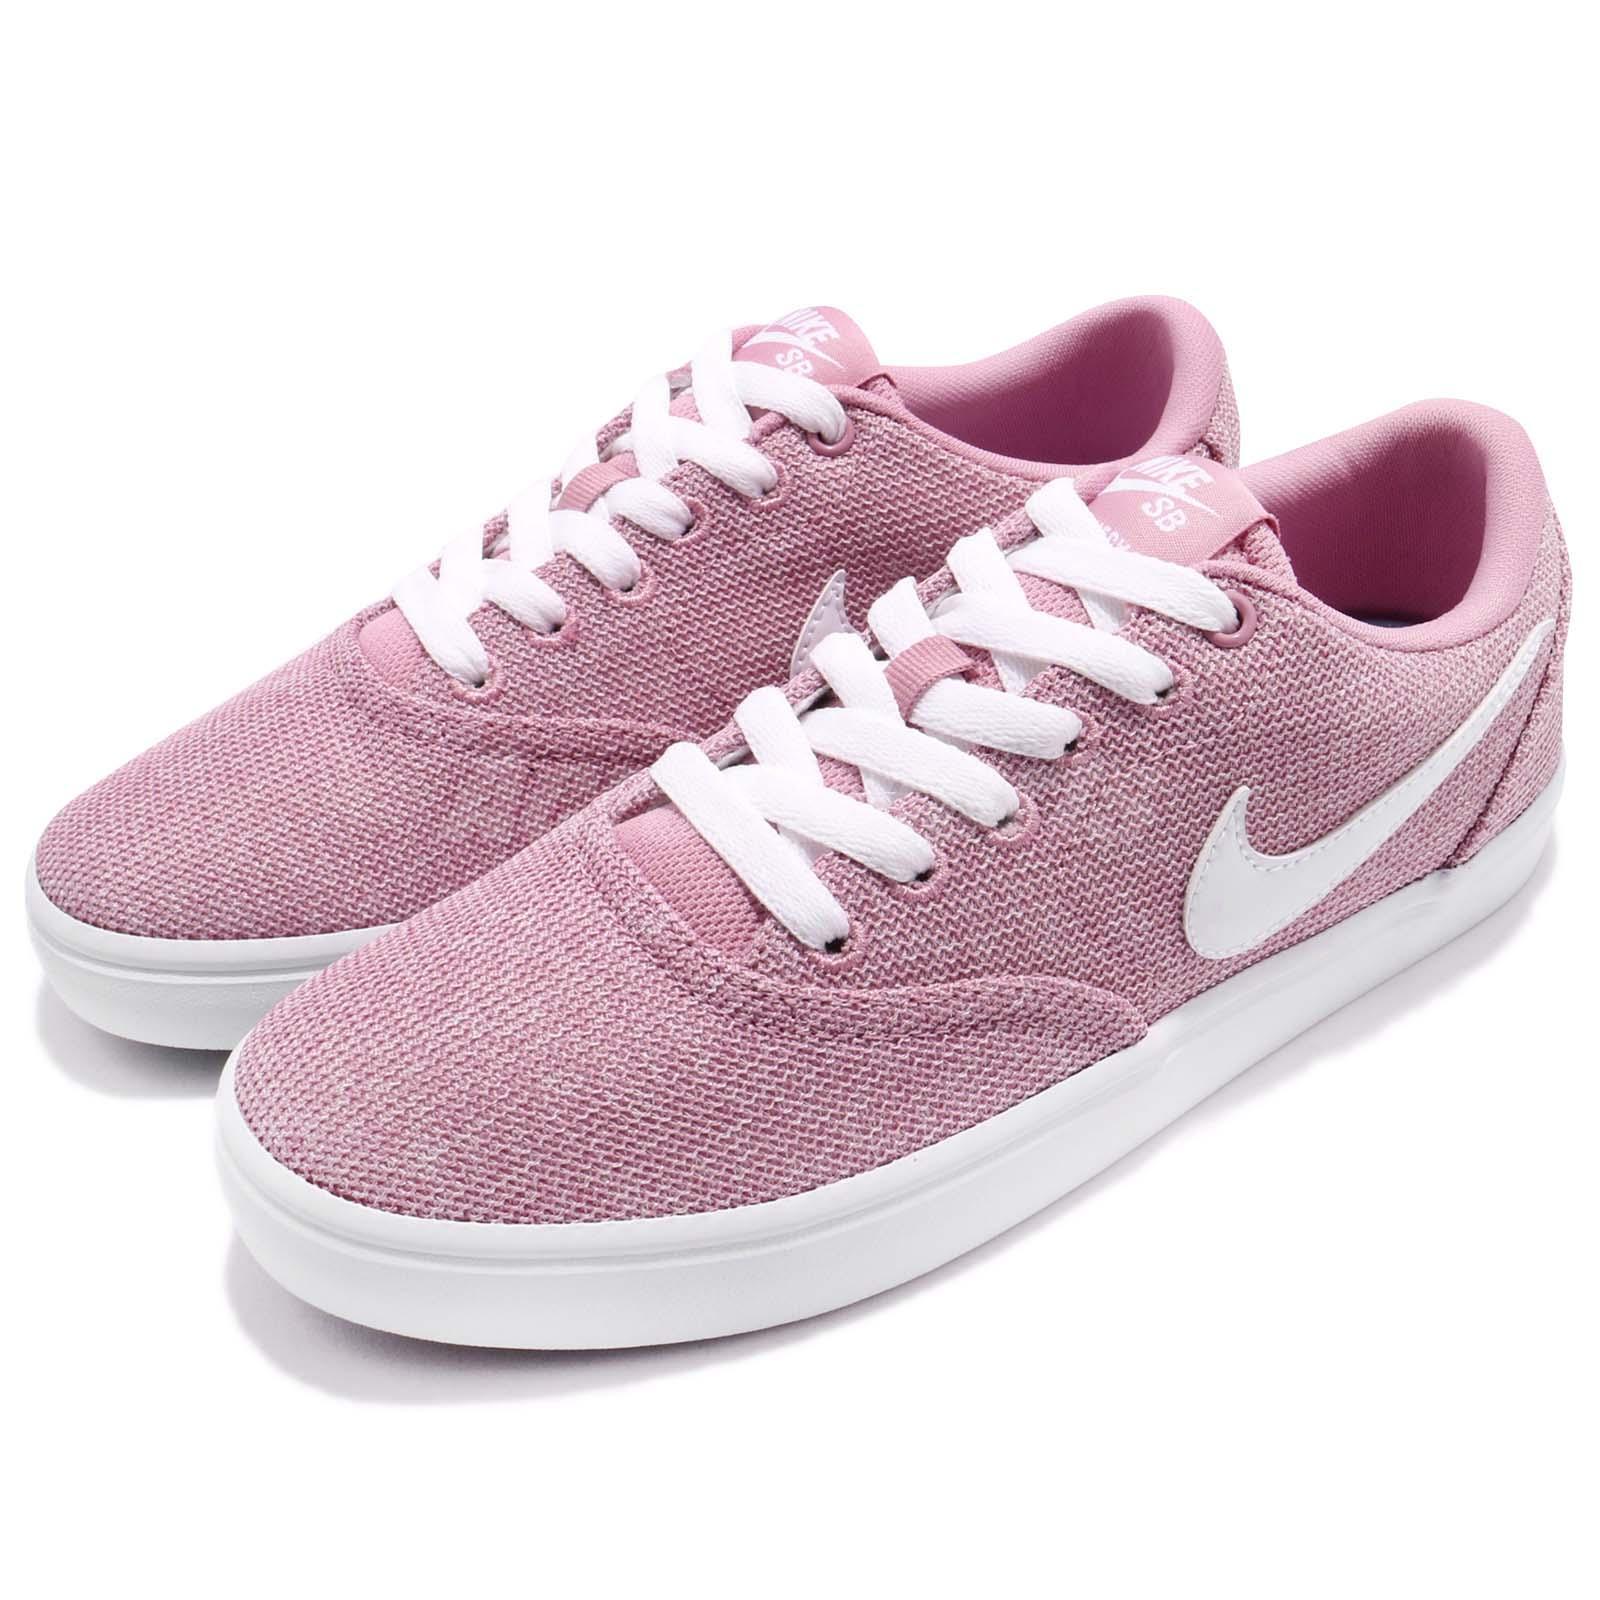 Wmns Nike SB Check Solar CVS P Canvas Pink White Women Skateboarding 921464-610